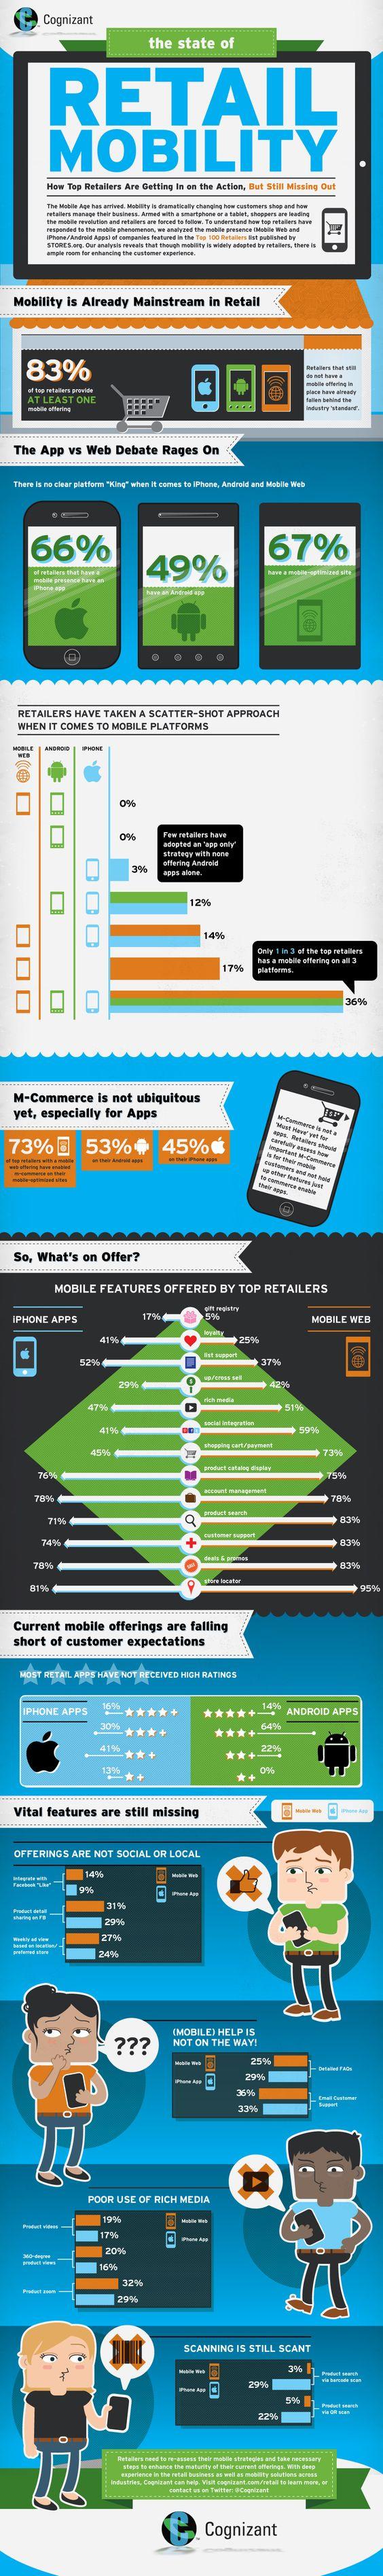 Mobile Retail Marketing